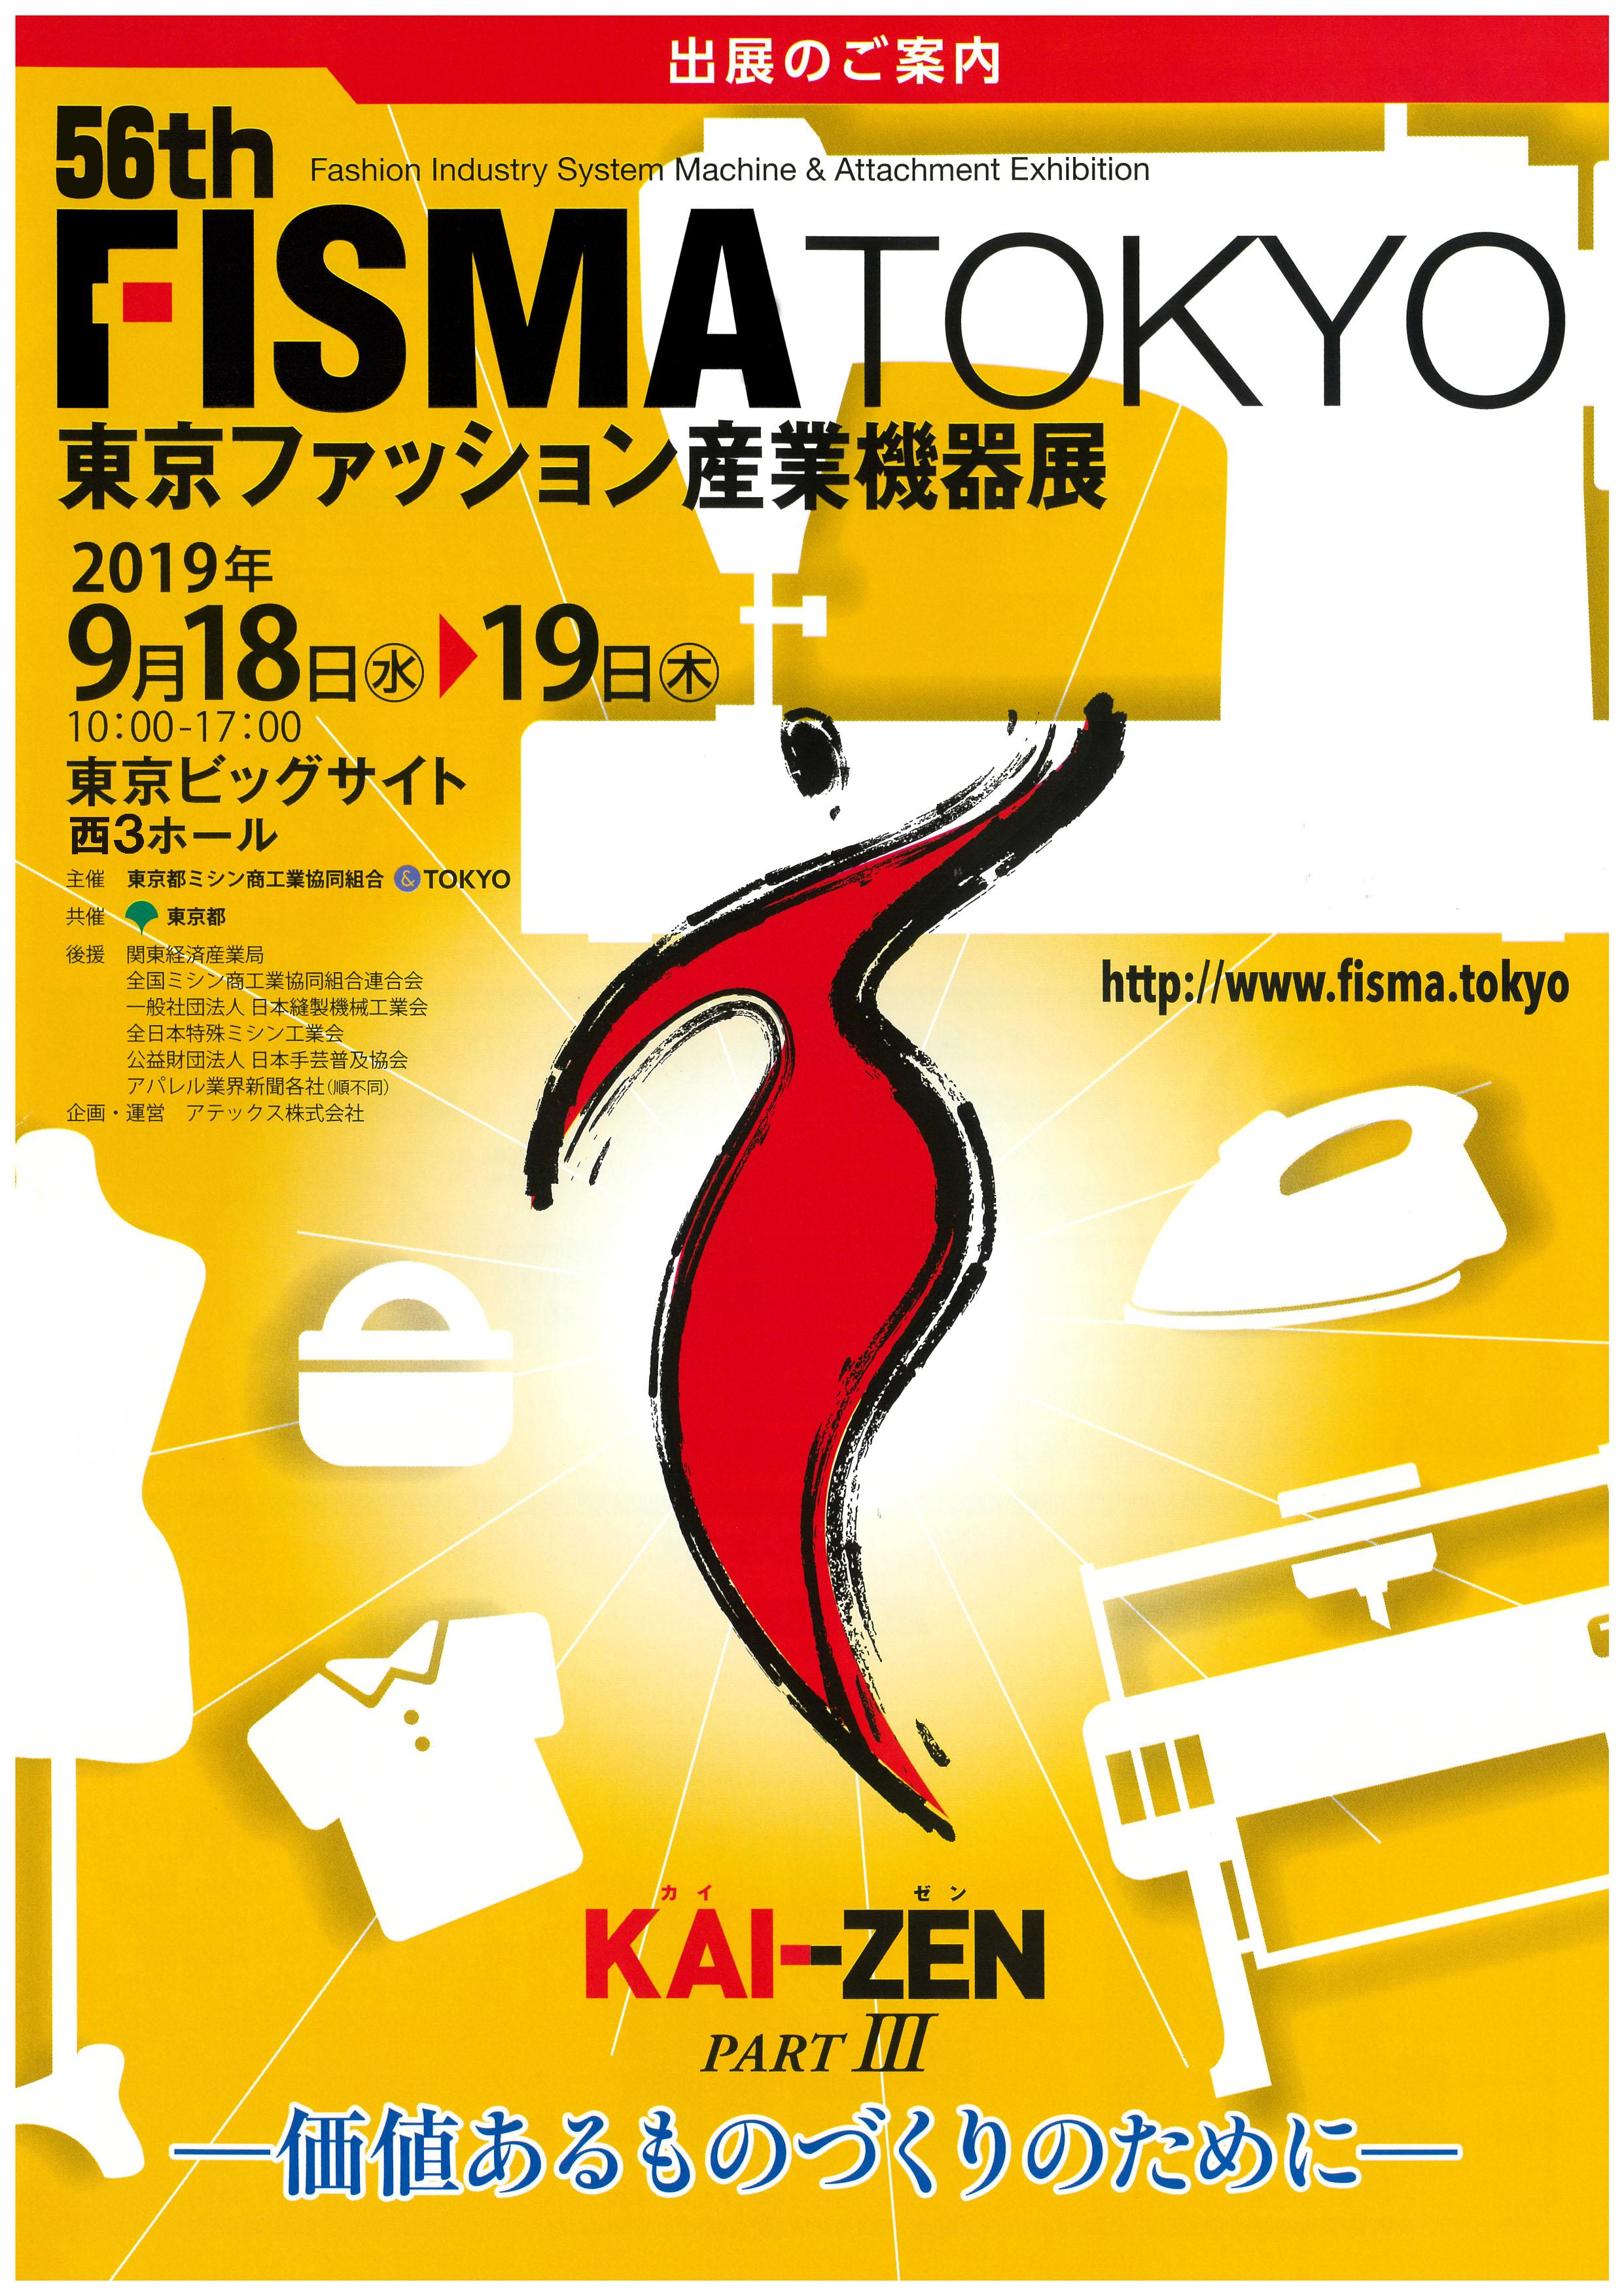 56th FISMA TOKYO 出展